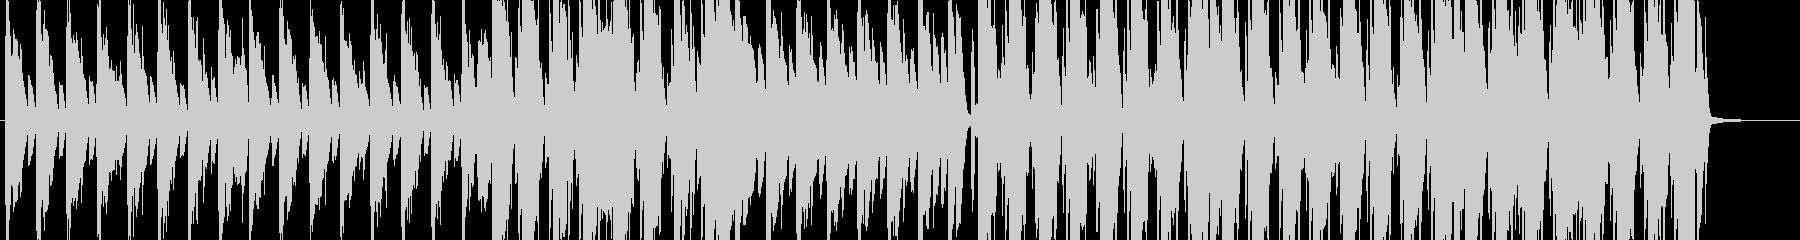 Kawaii×シャボン玉【歌なし】の未再生の波形